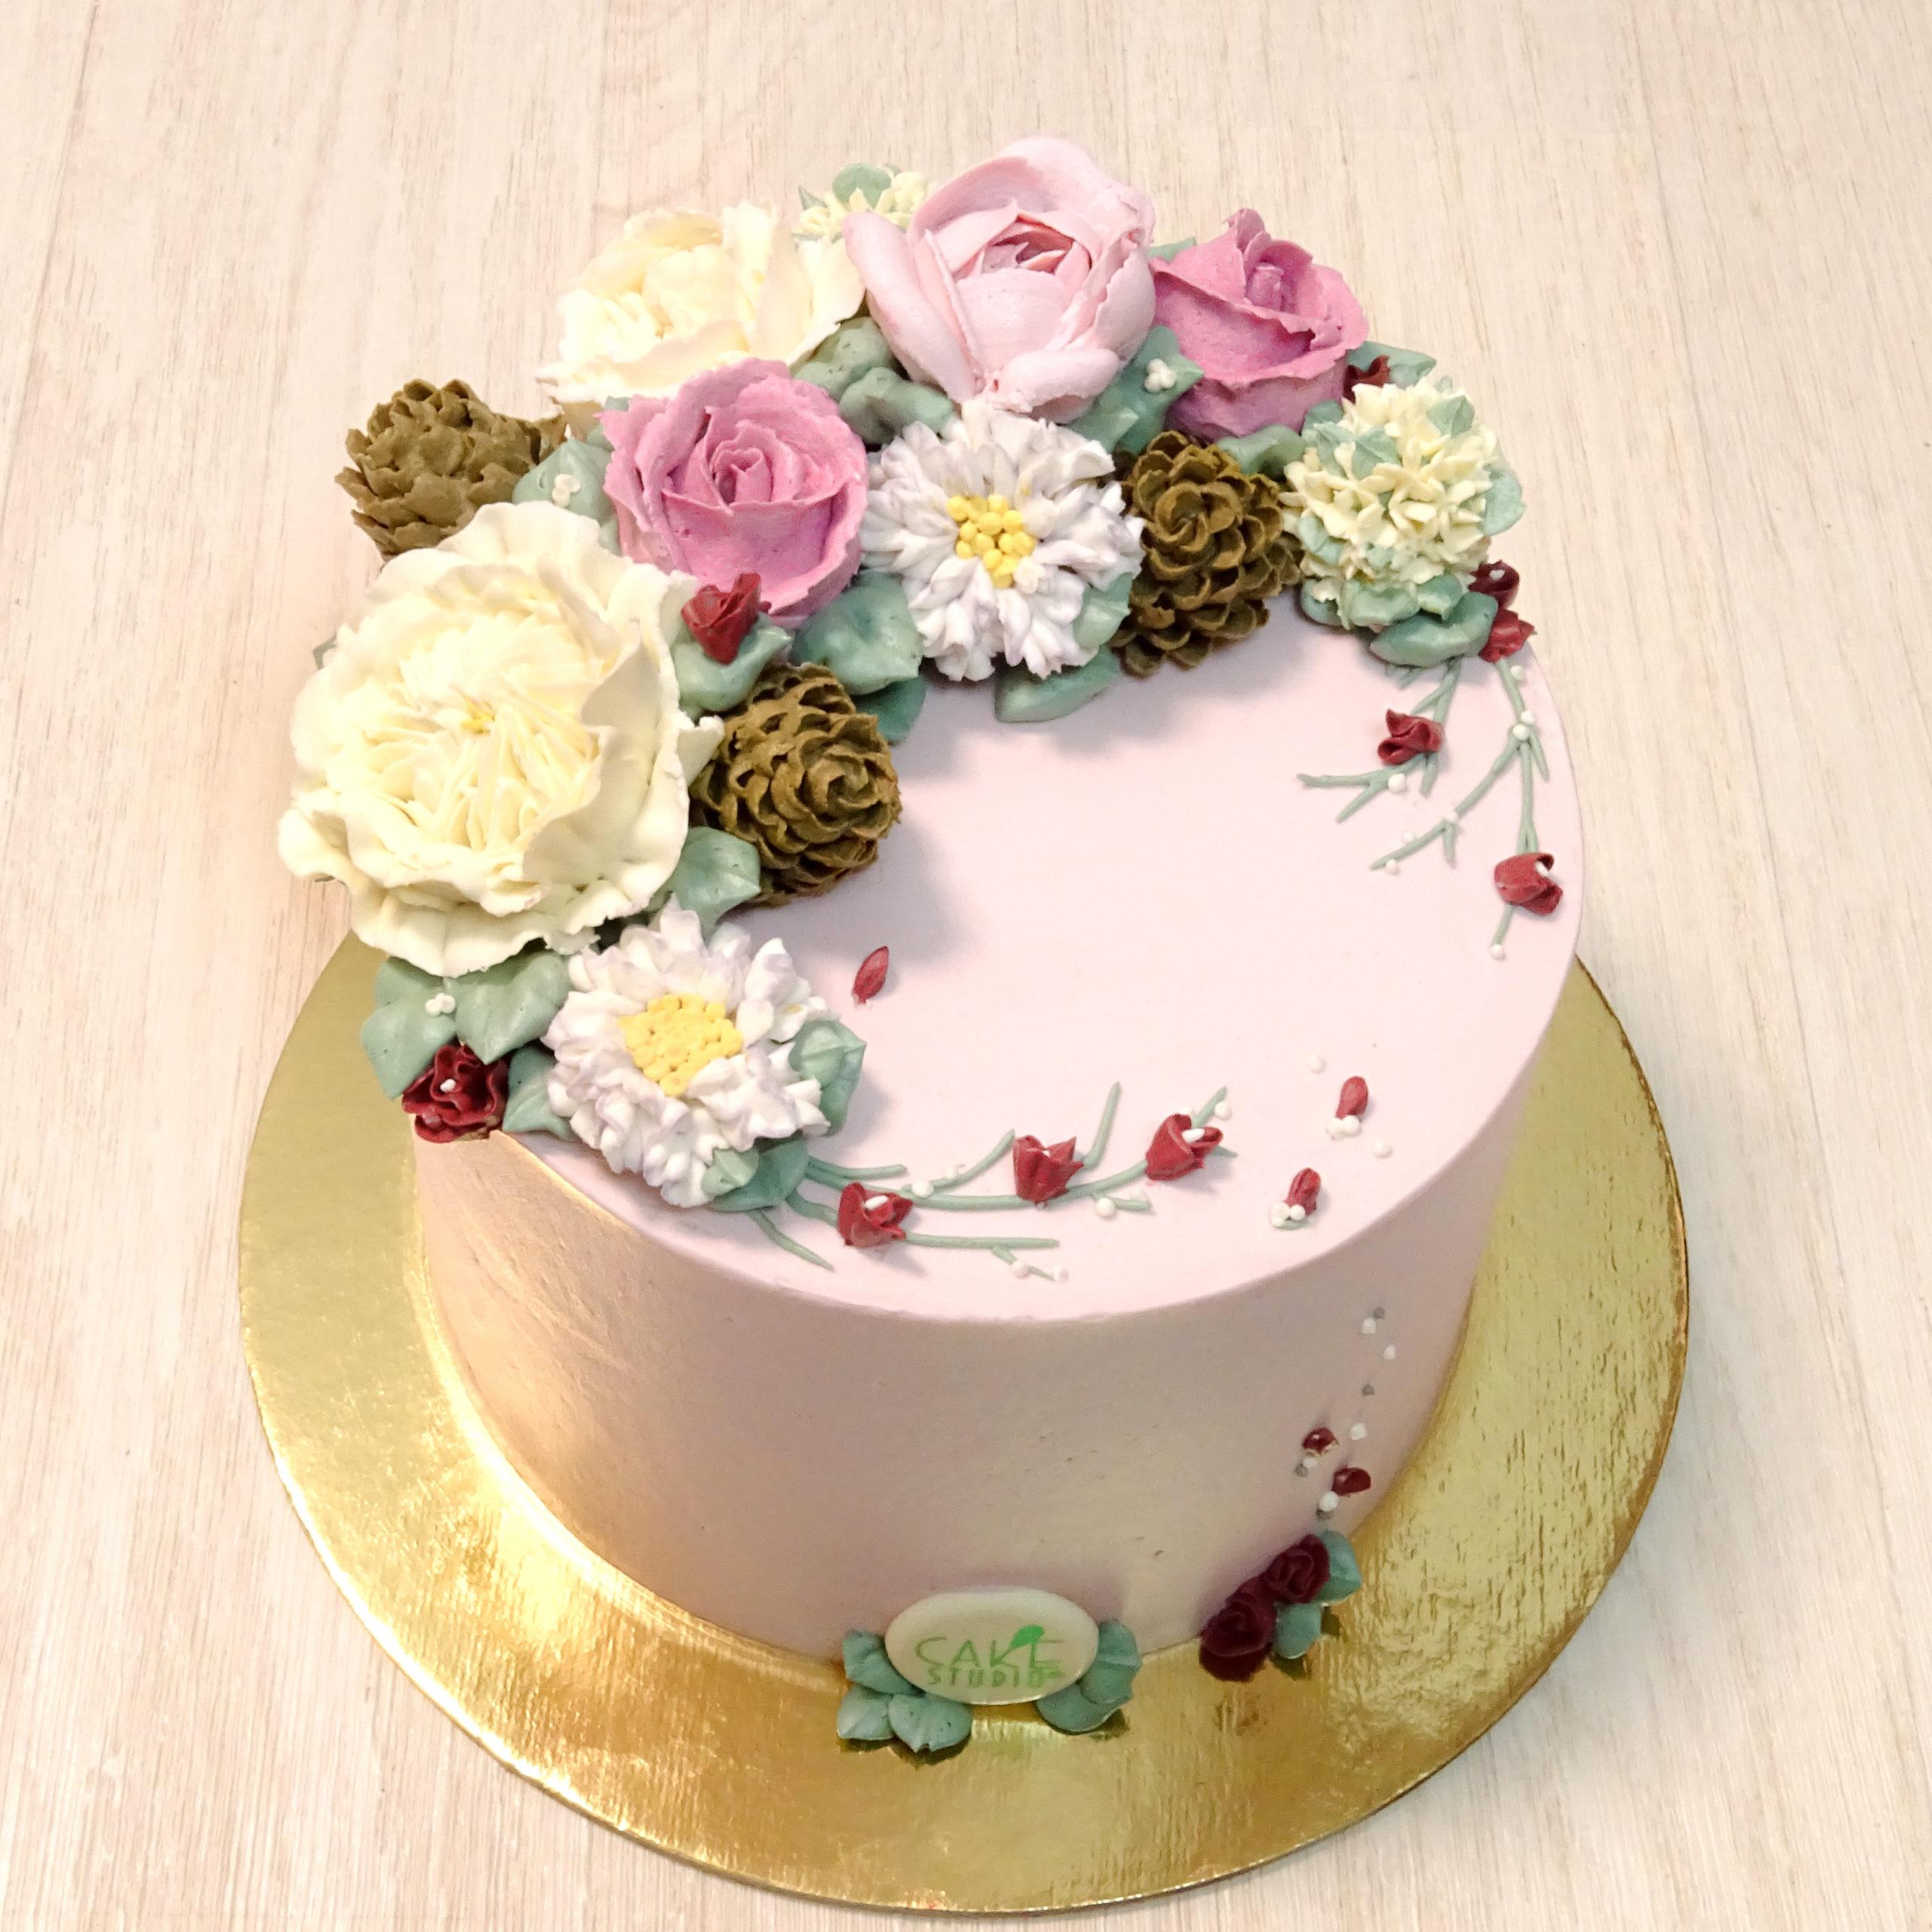 torta compleanno fiori pigne burro